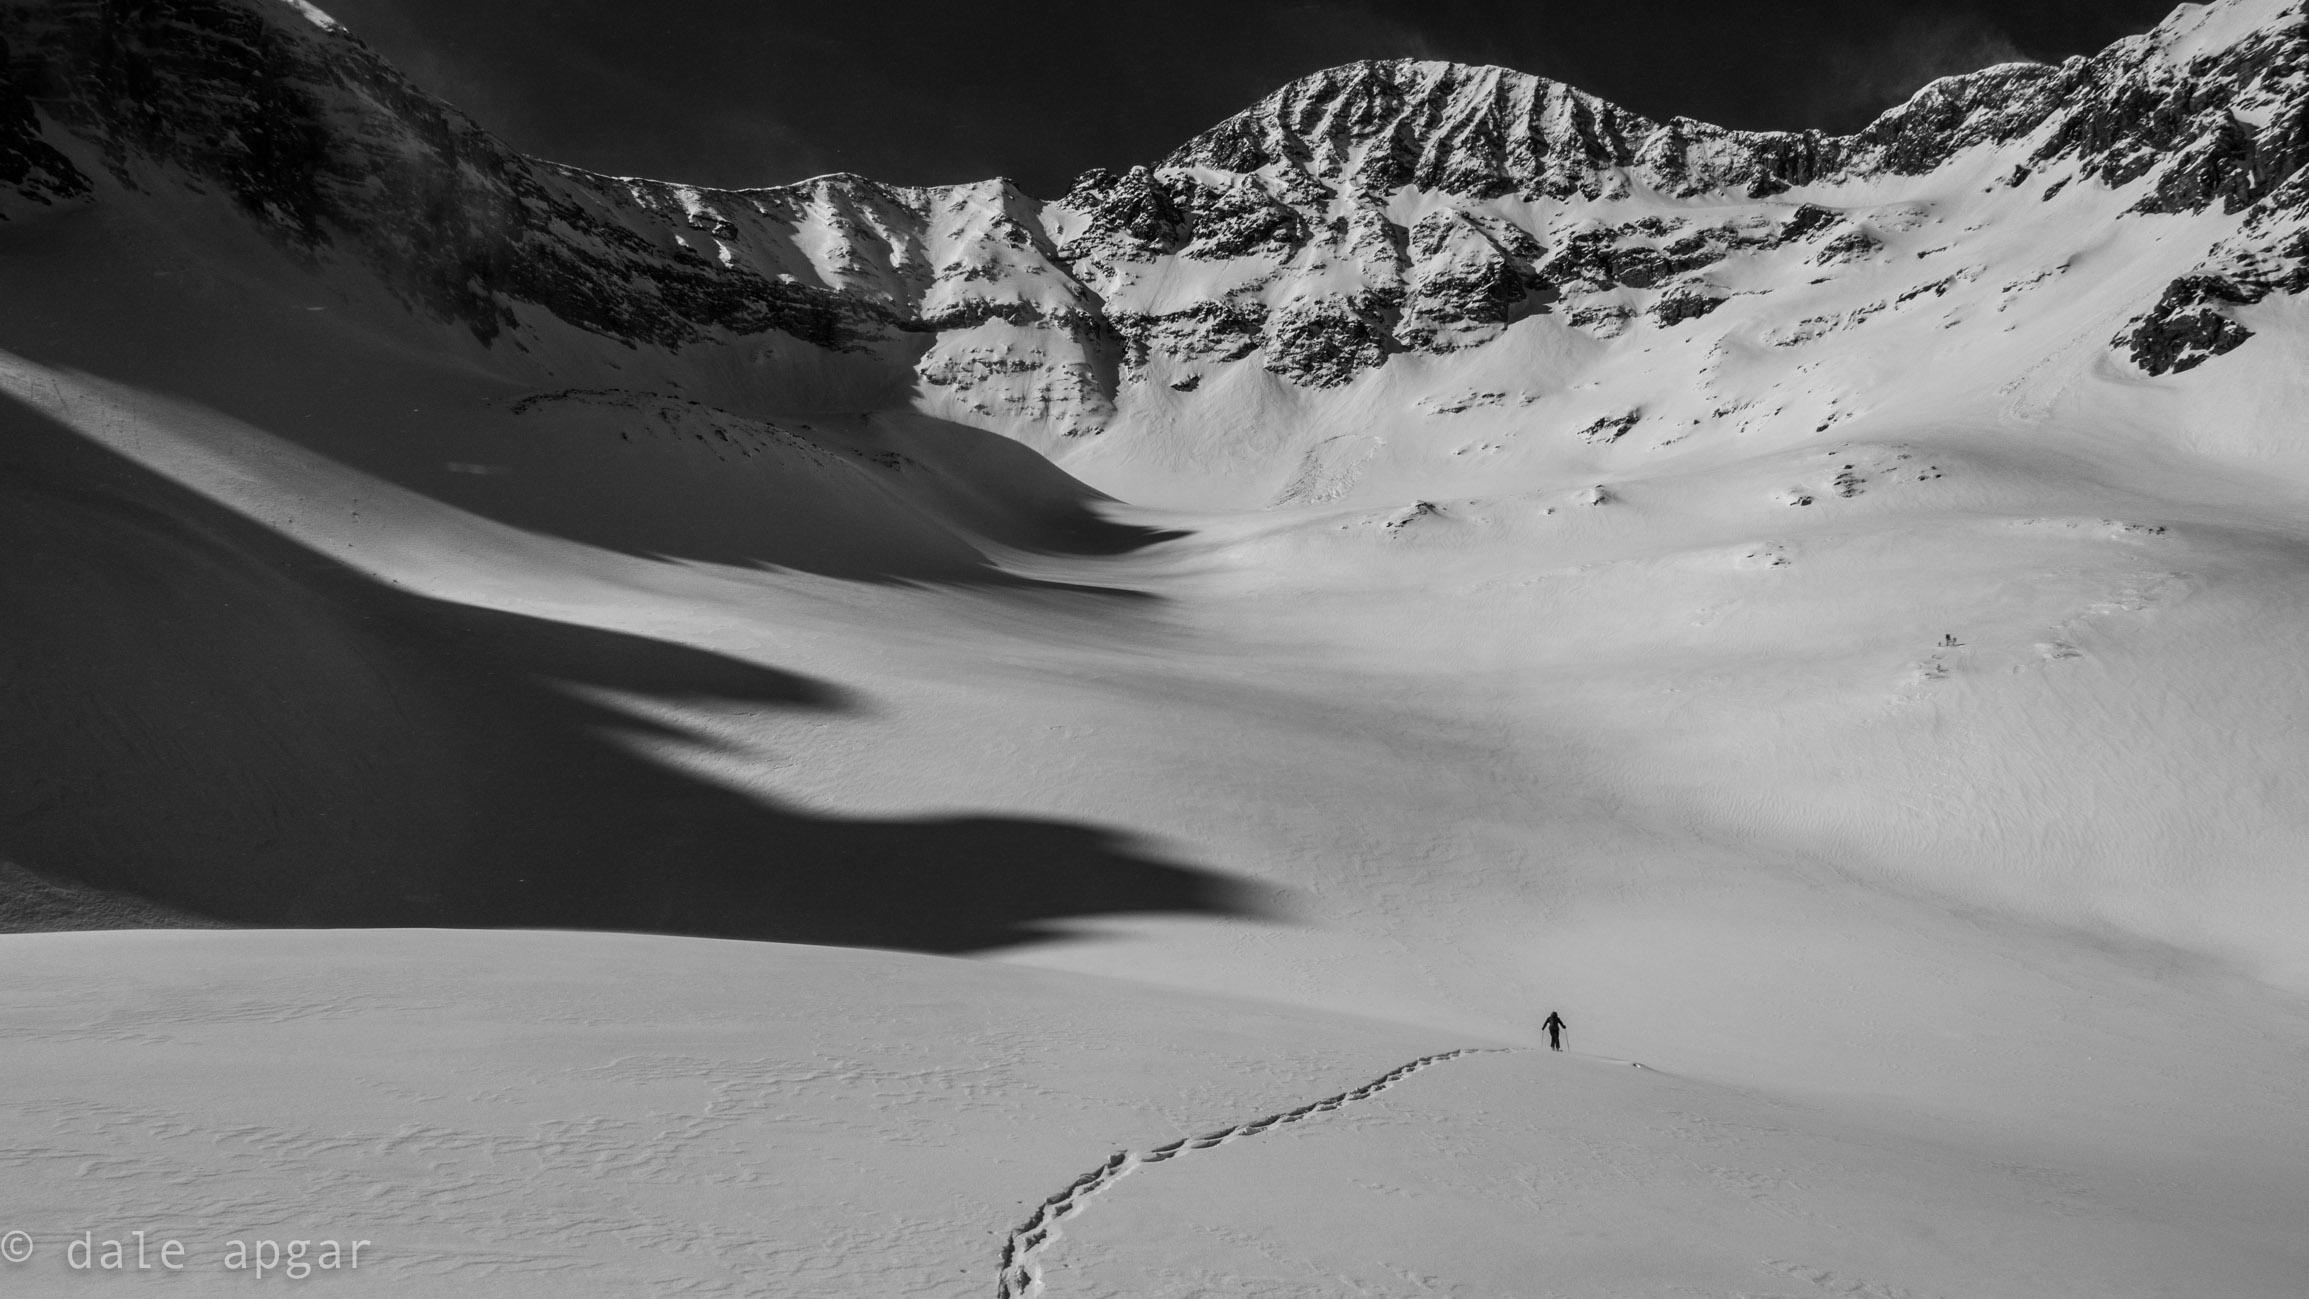 dale_apgar_ski-20.jpg